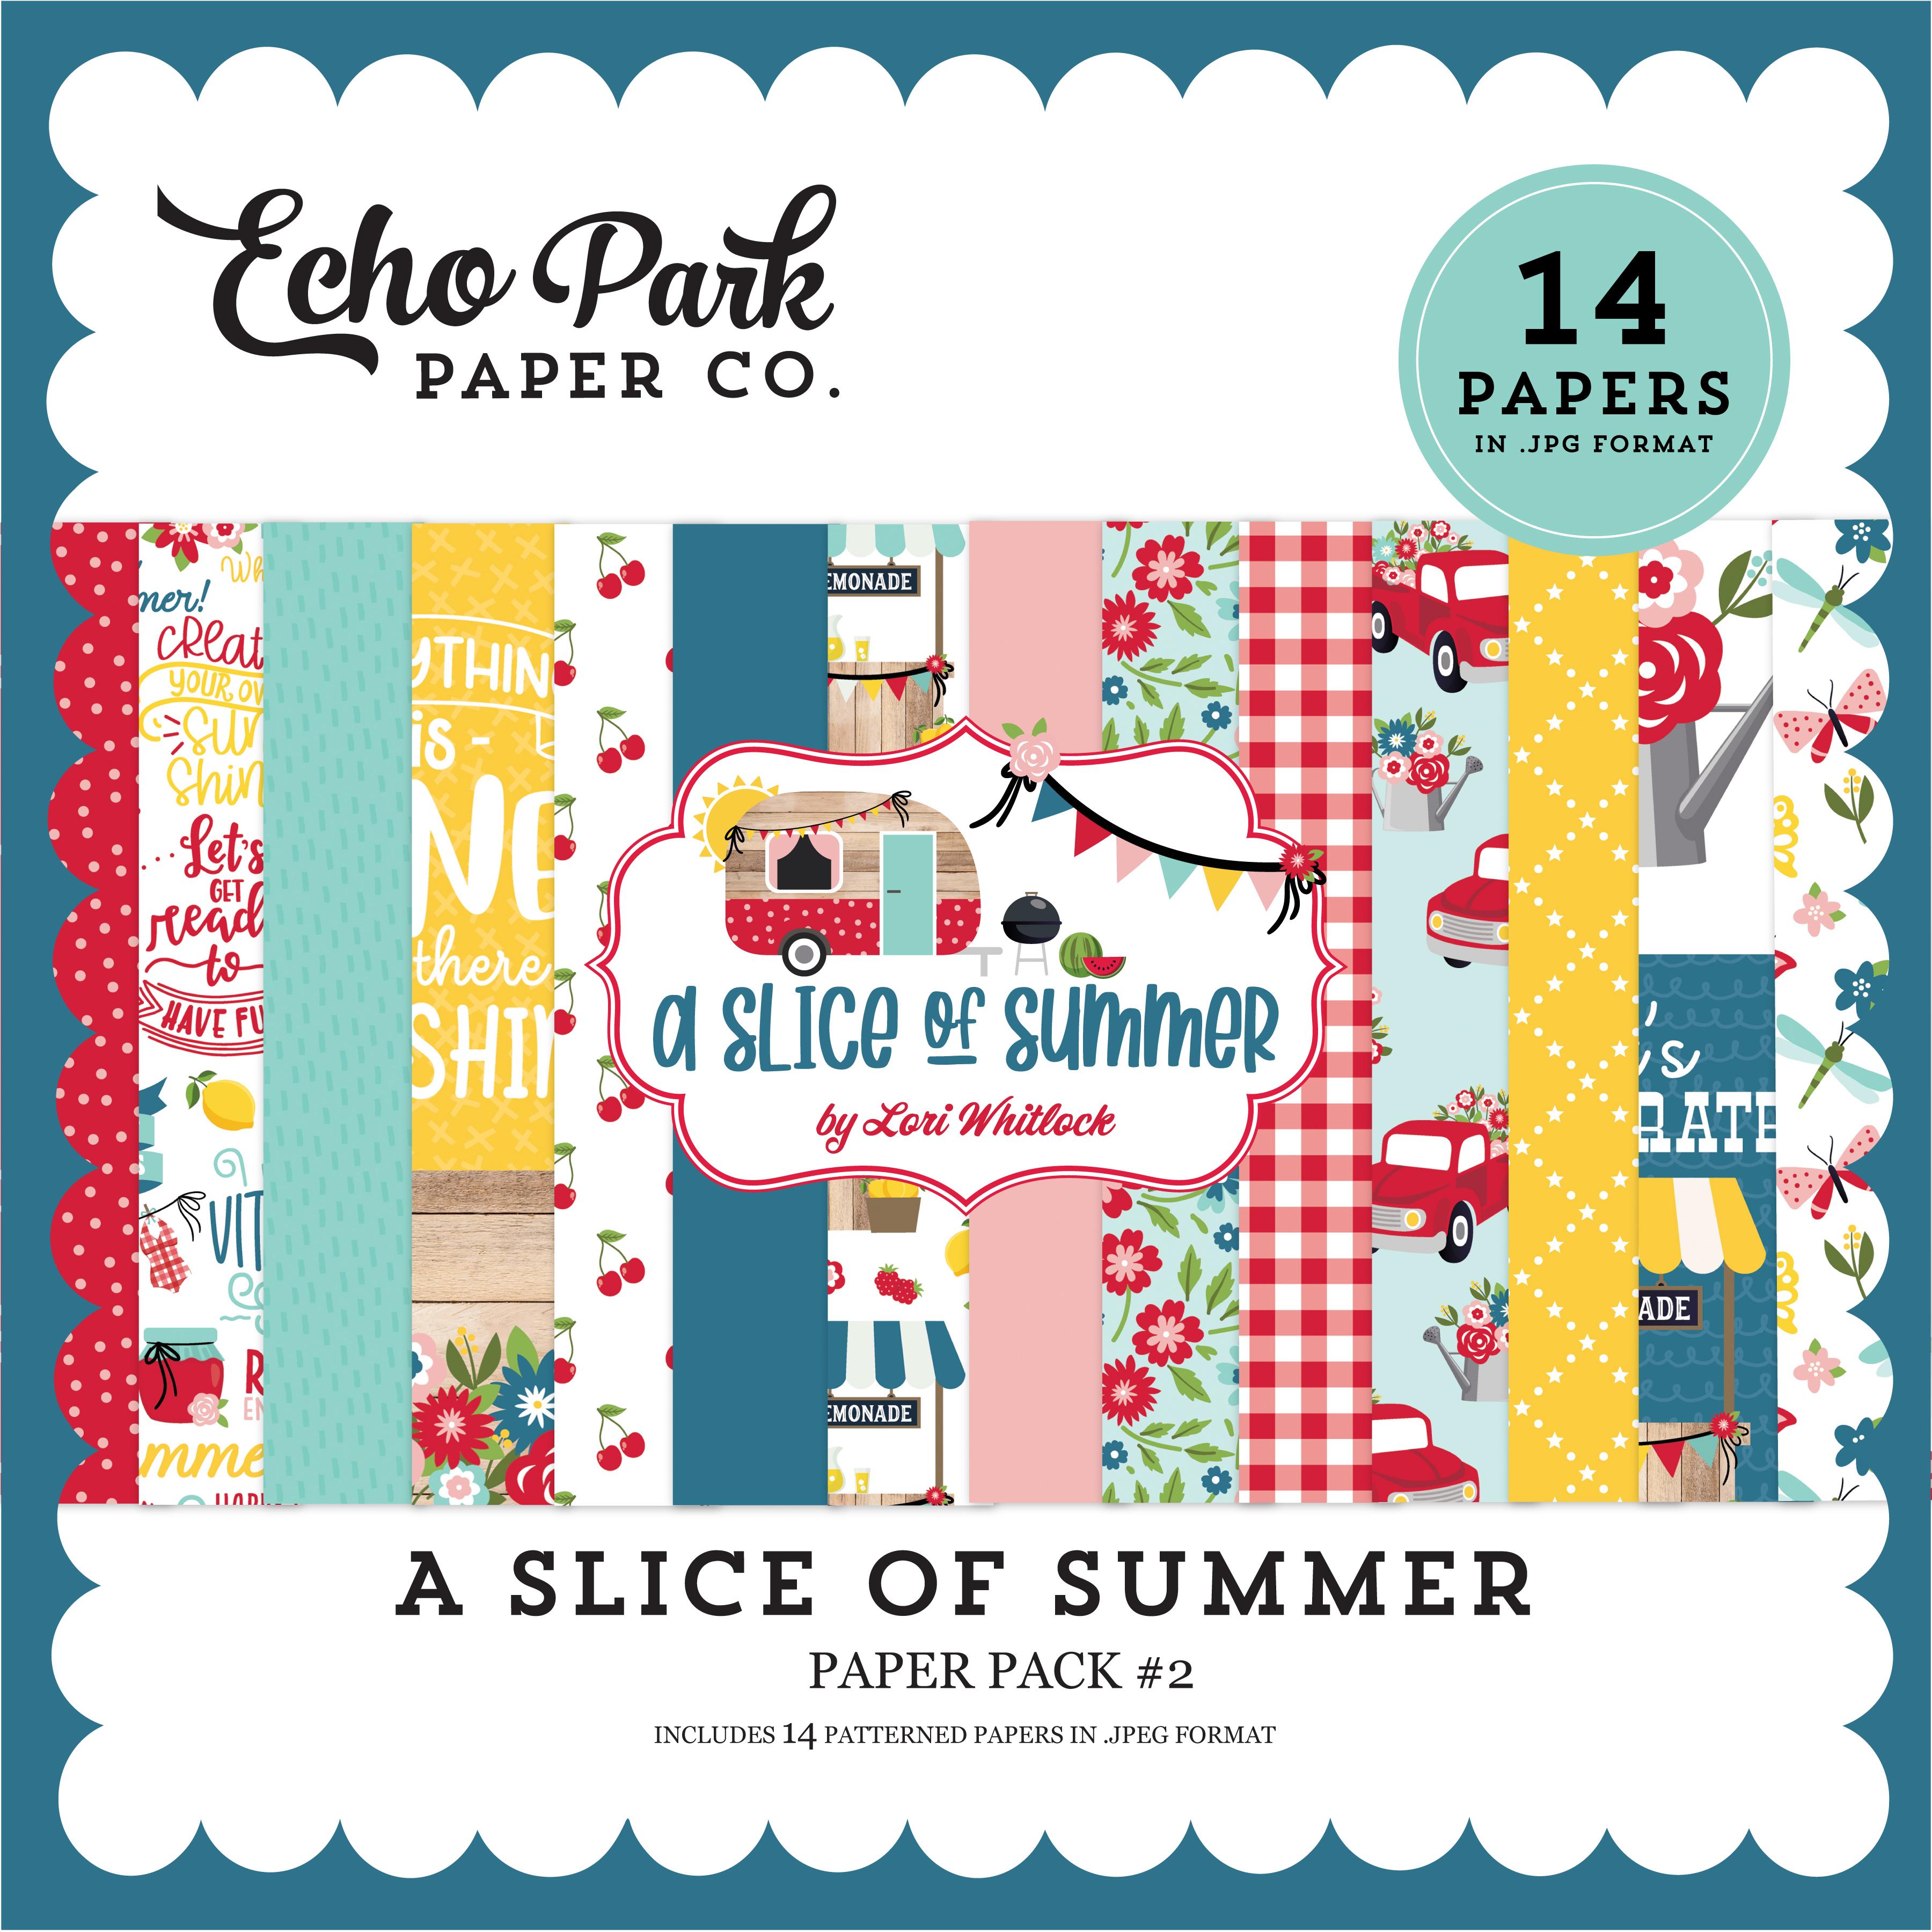 A Slice of Summer Paper Pack #2